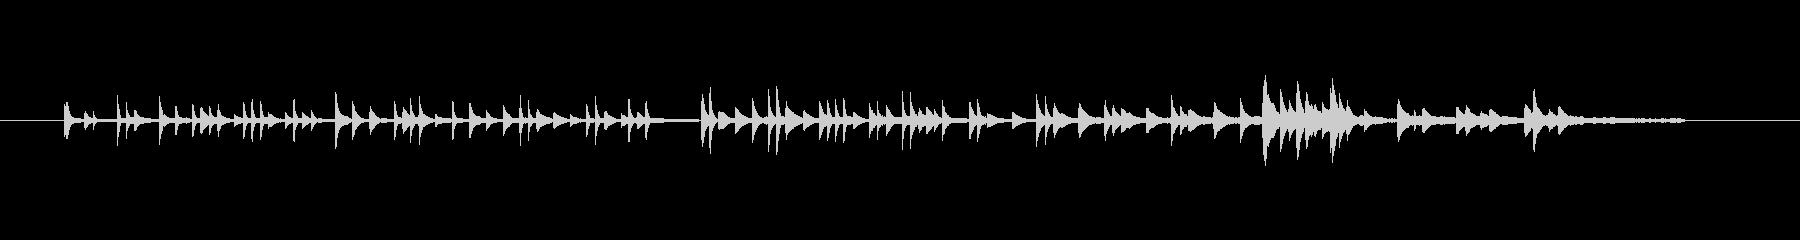 Theme PF ver2(「幸色のワンルーム」背景音楽)の未再生の波形